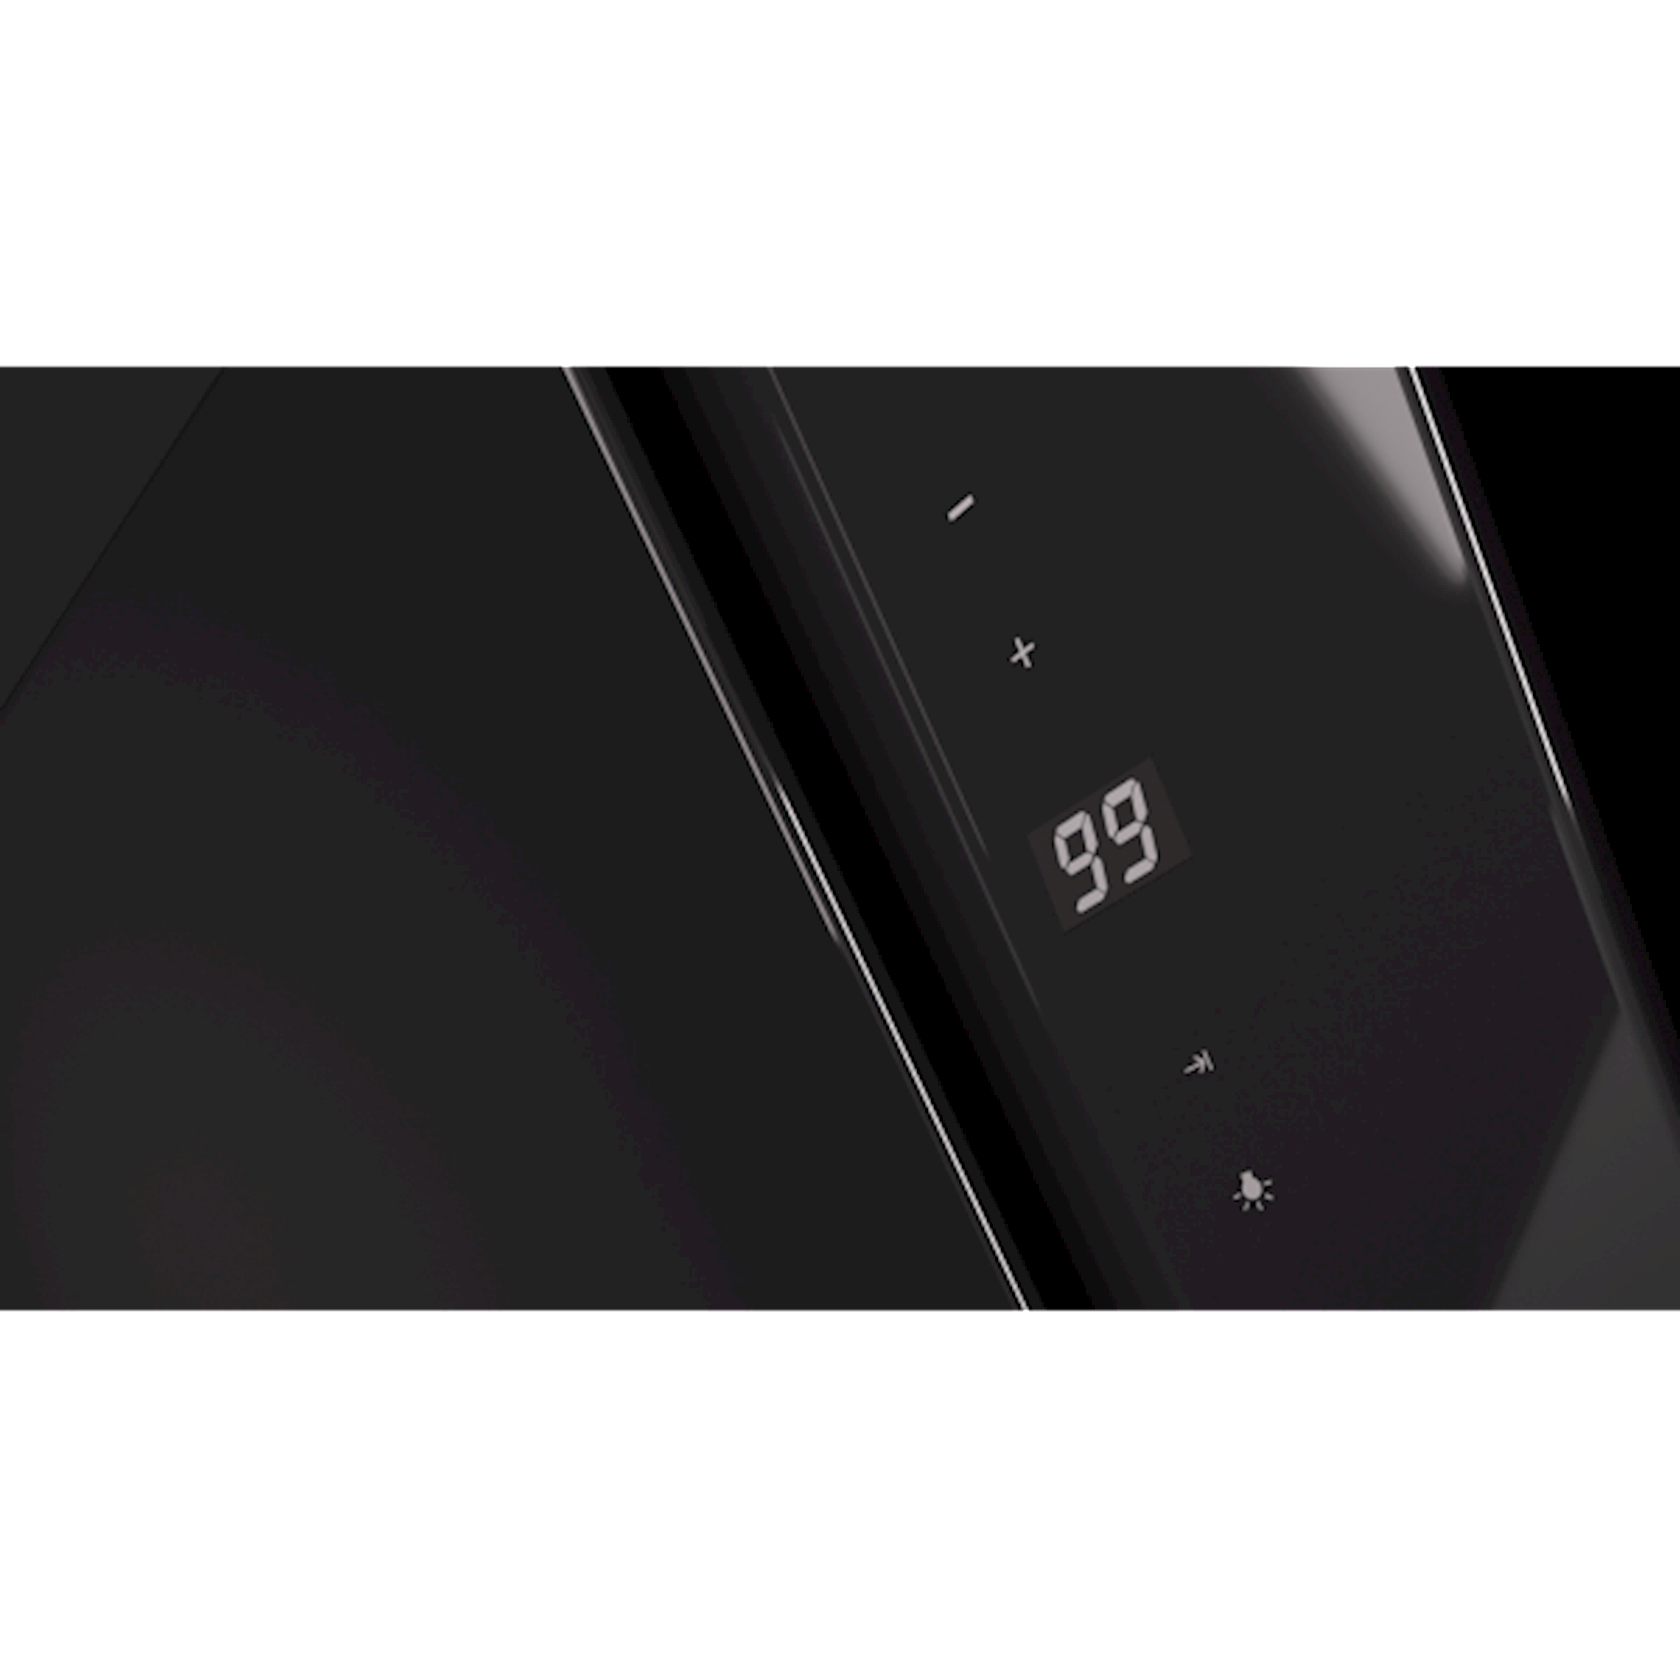 Aspirator Teka DVT 685 (Black Glass)